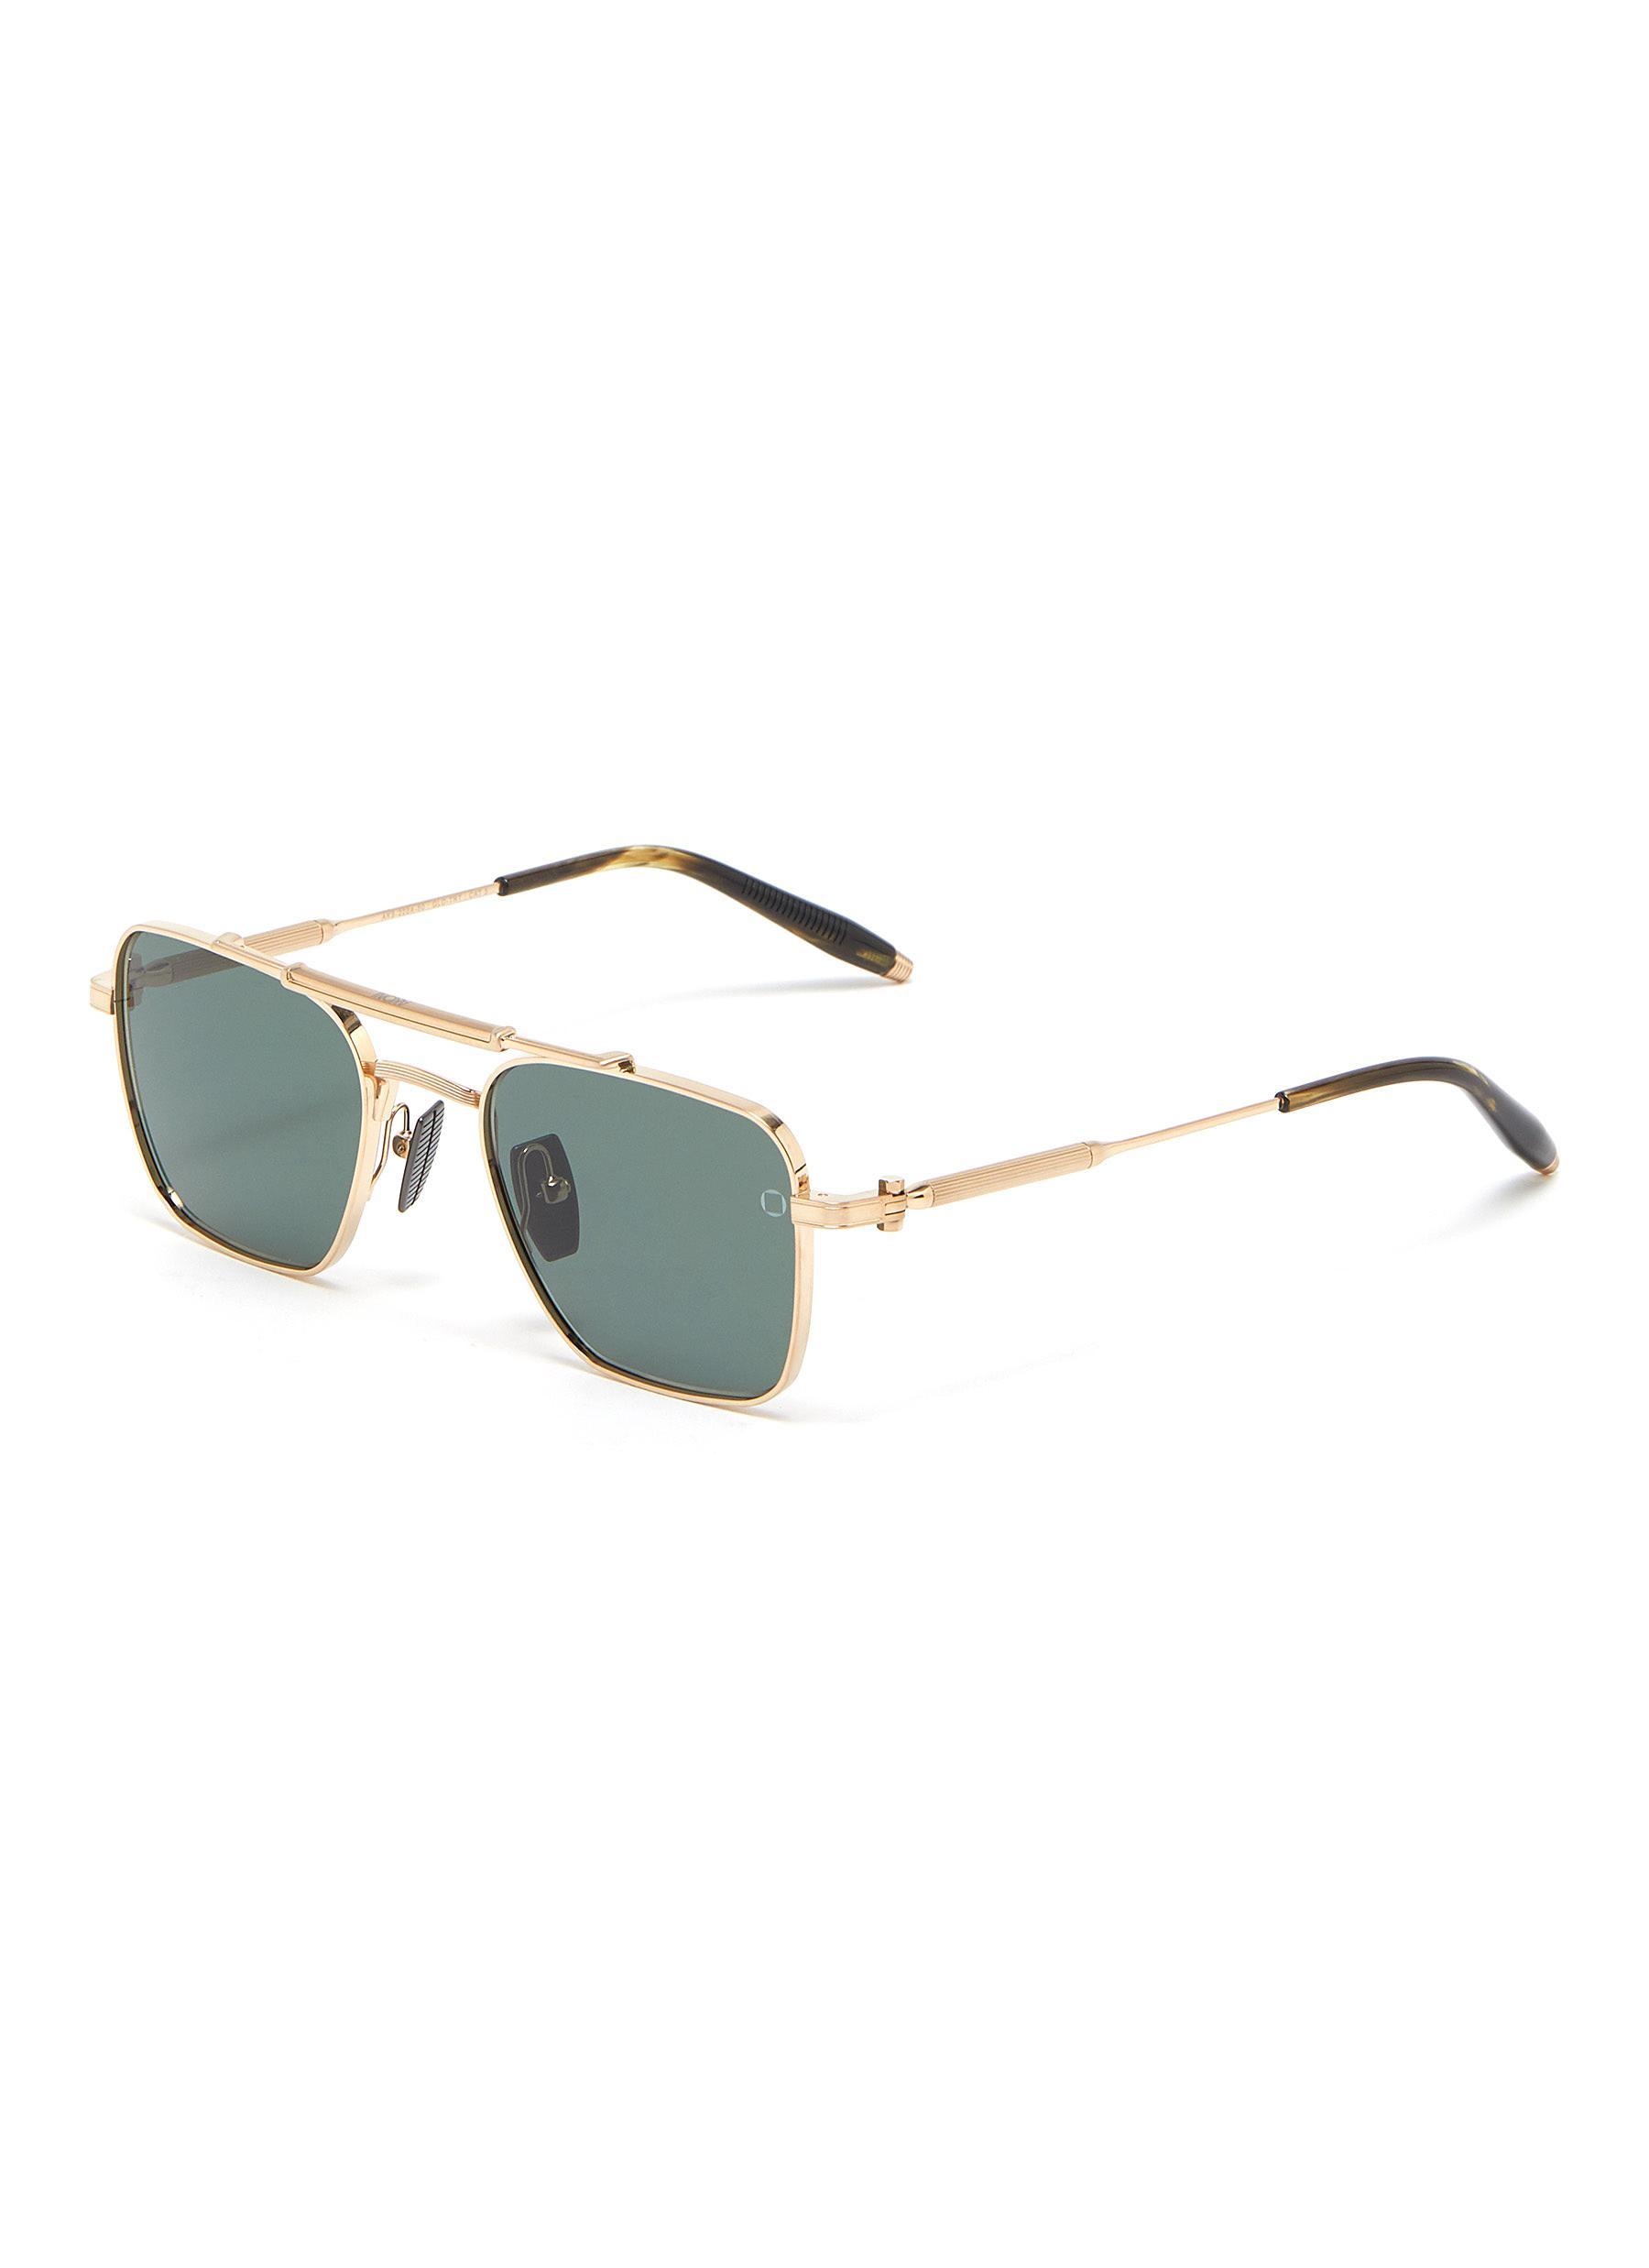 'Europa' square aviator sunglasses